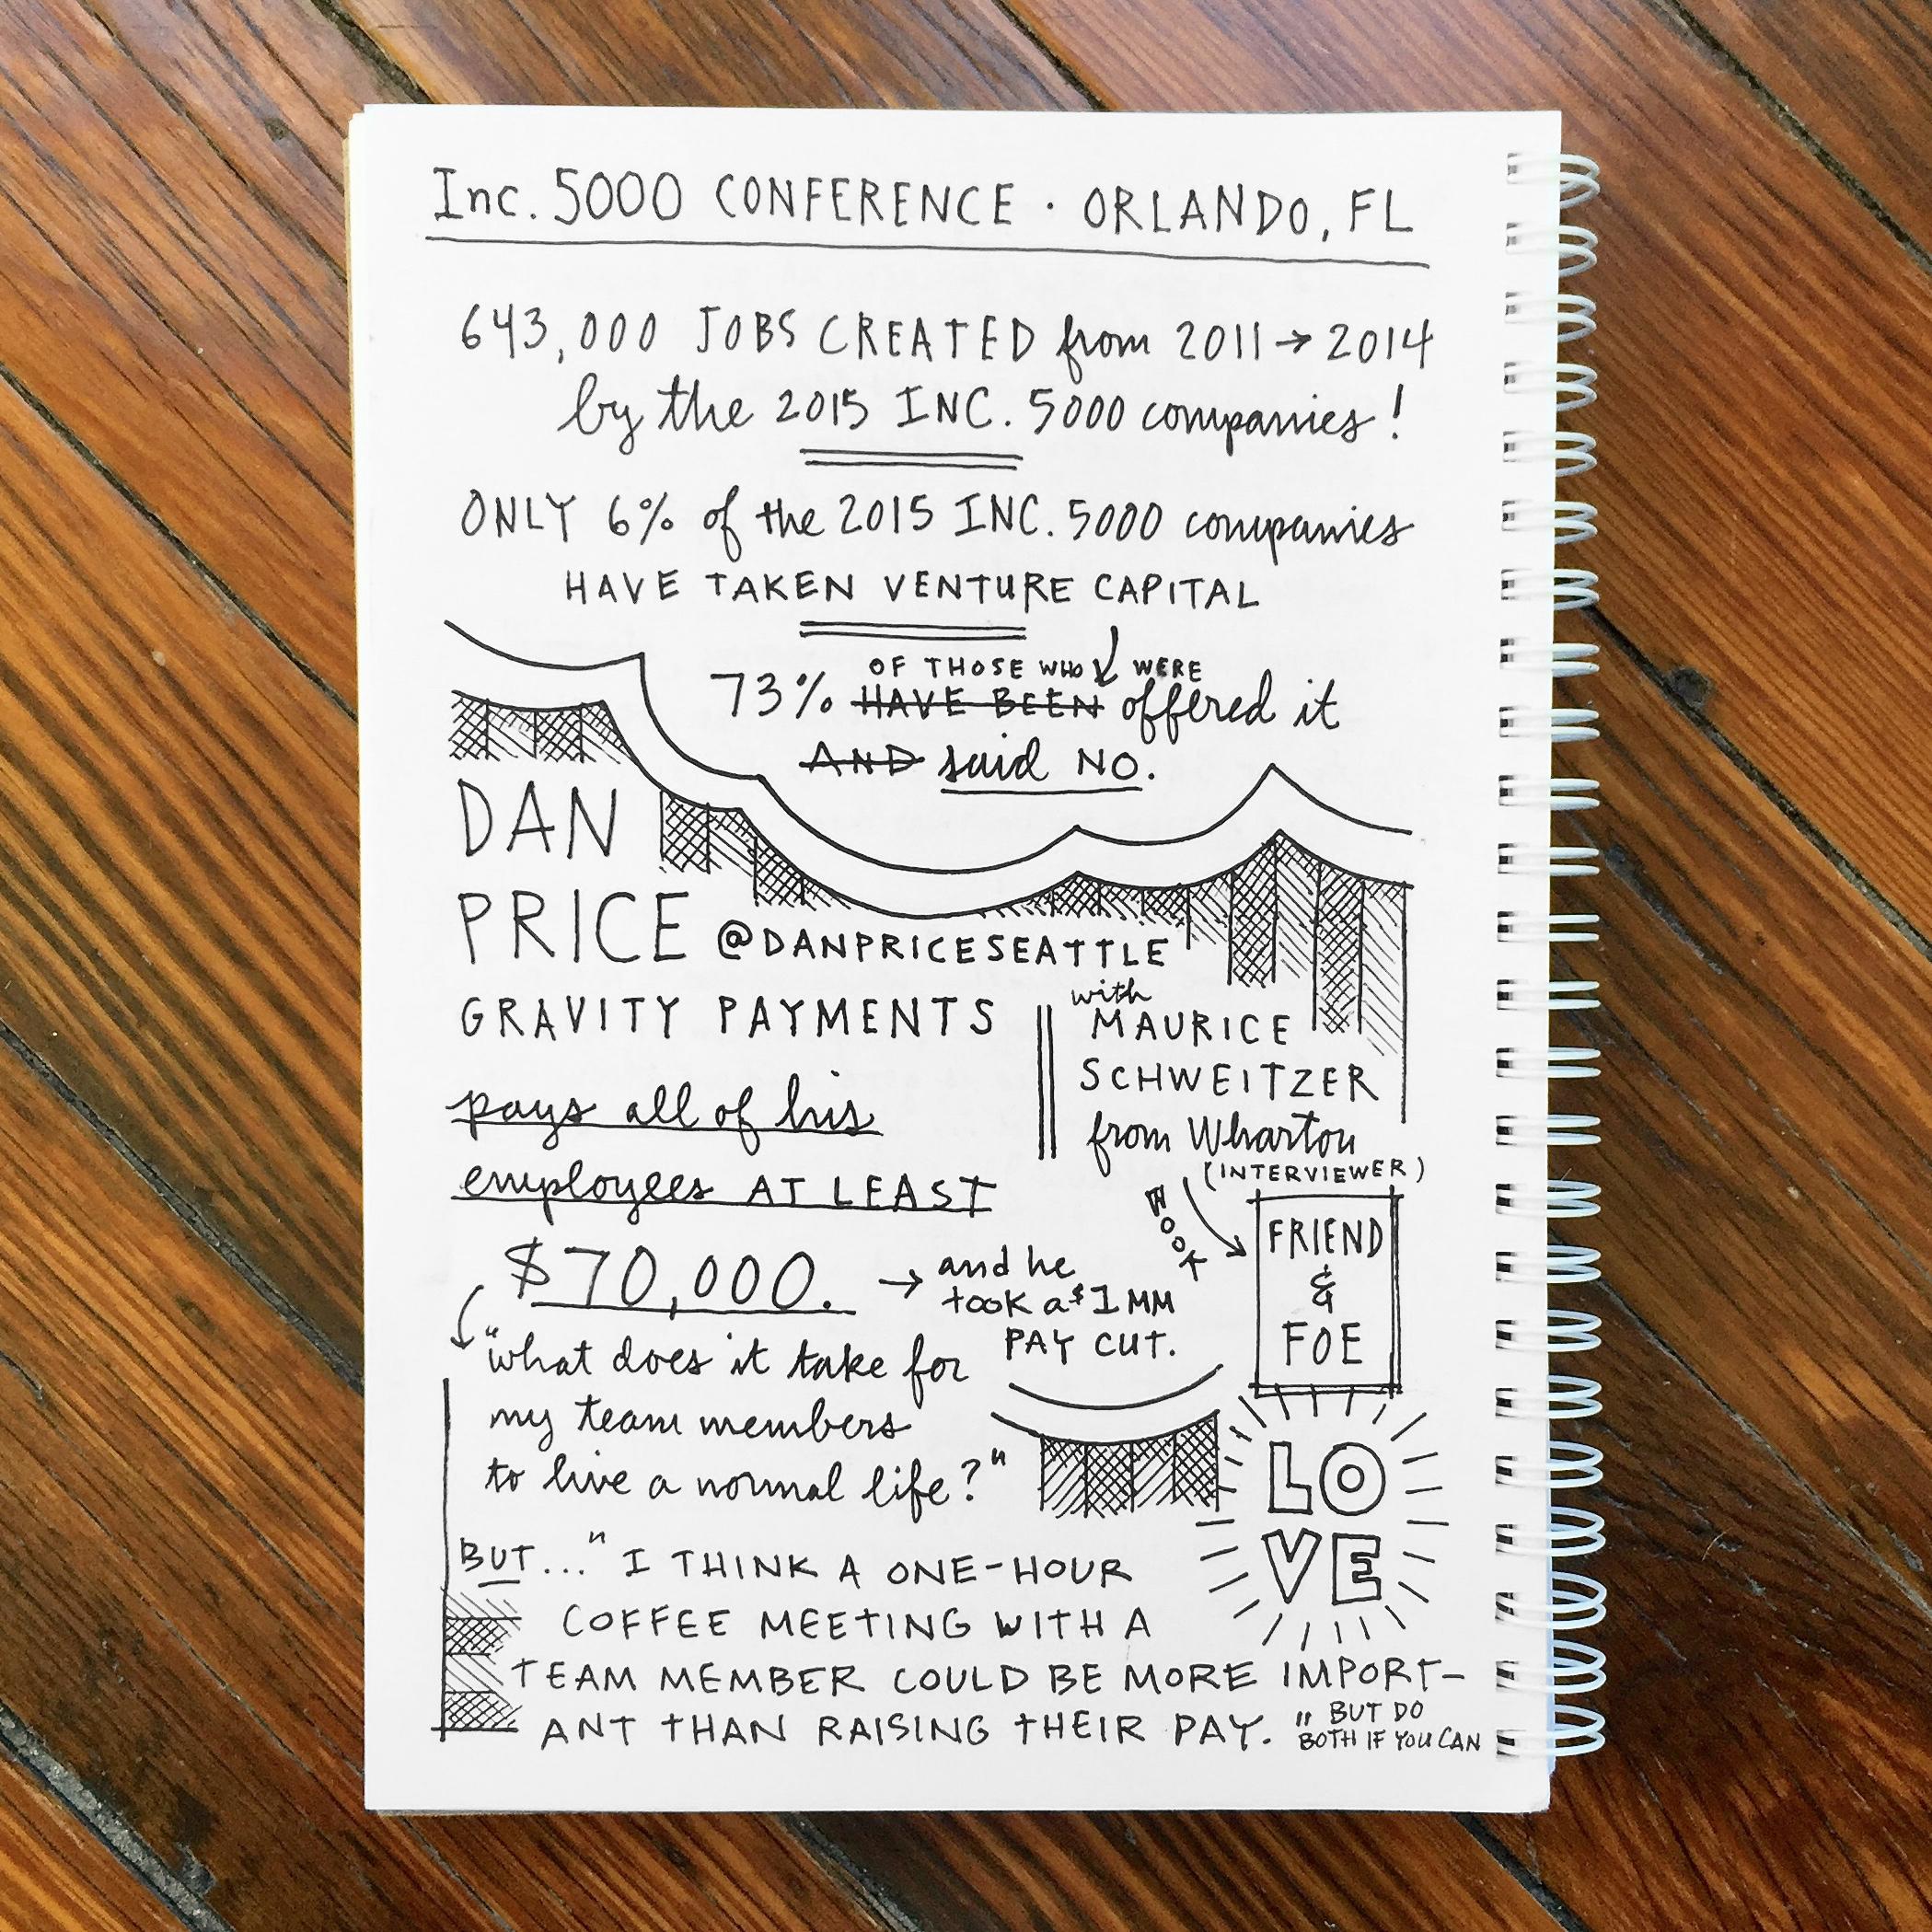 Inc5000-2015-Sketchnotes1